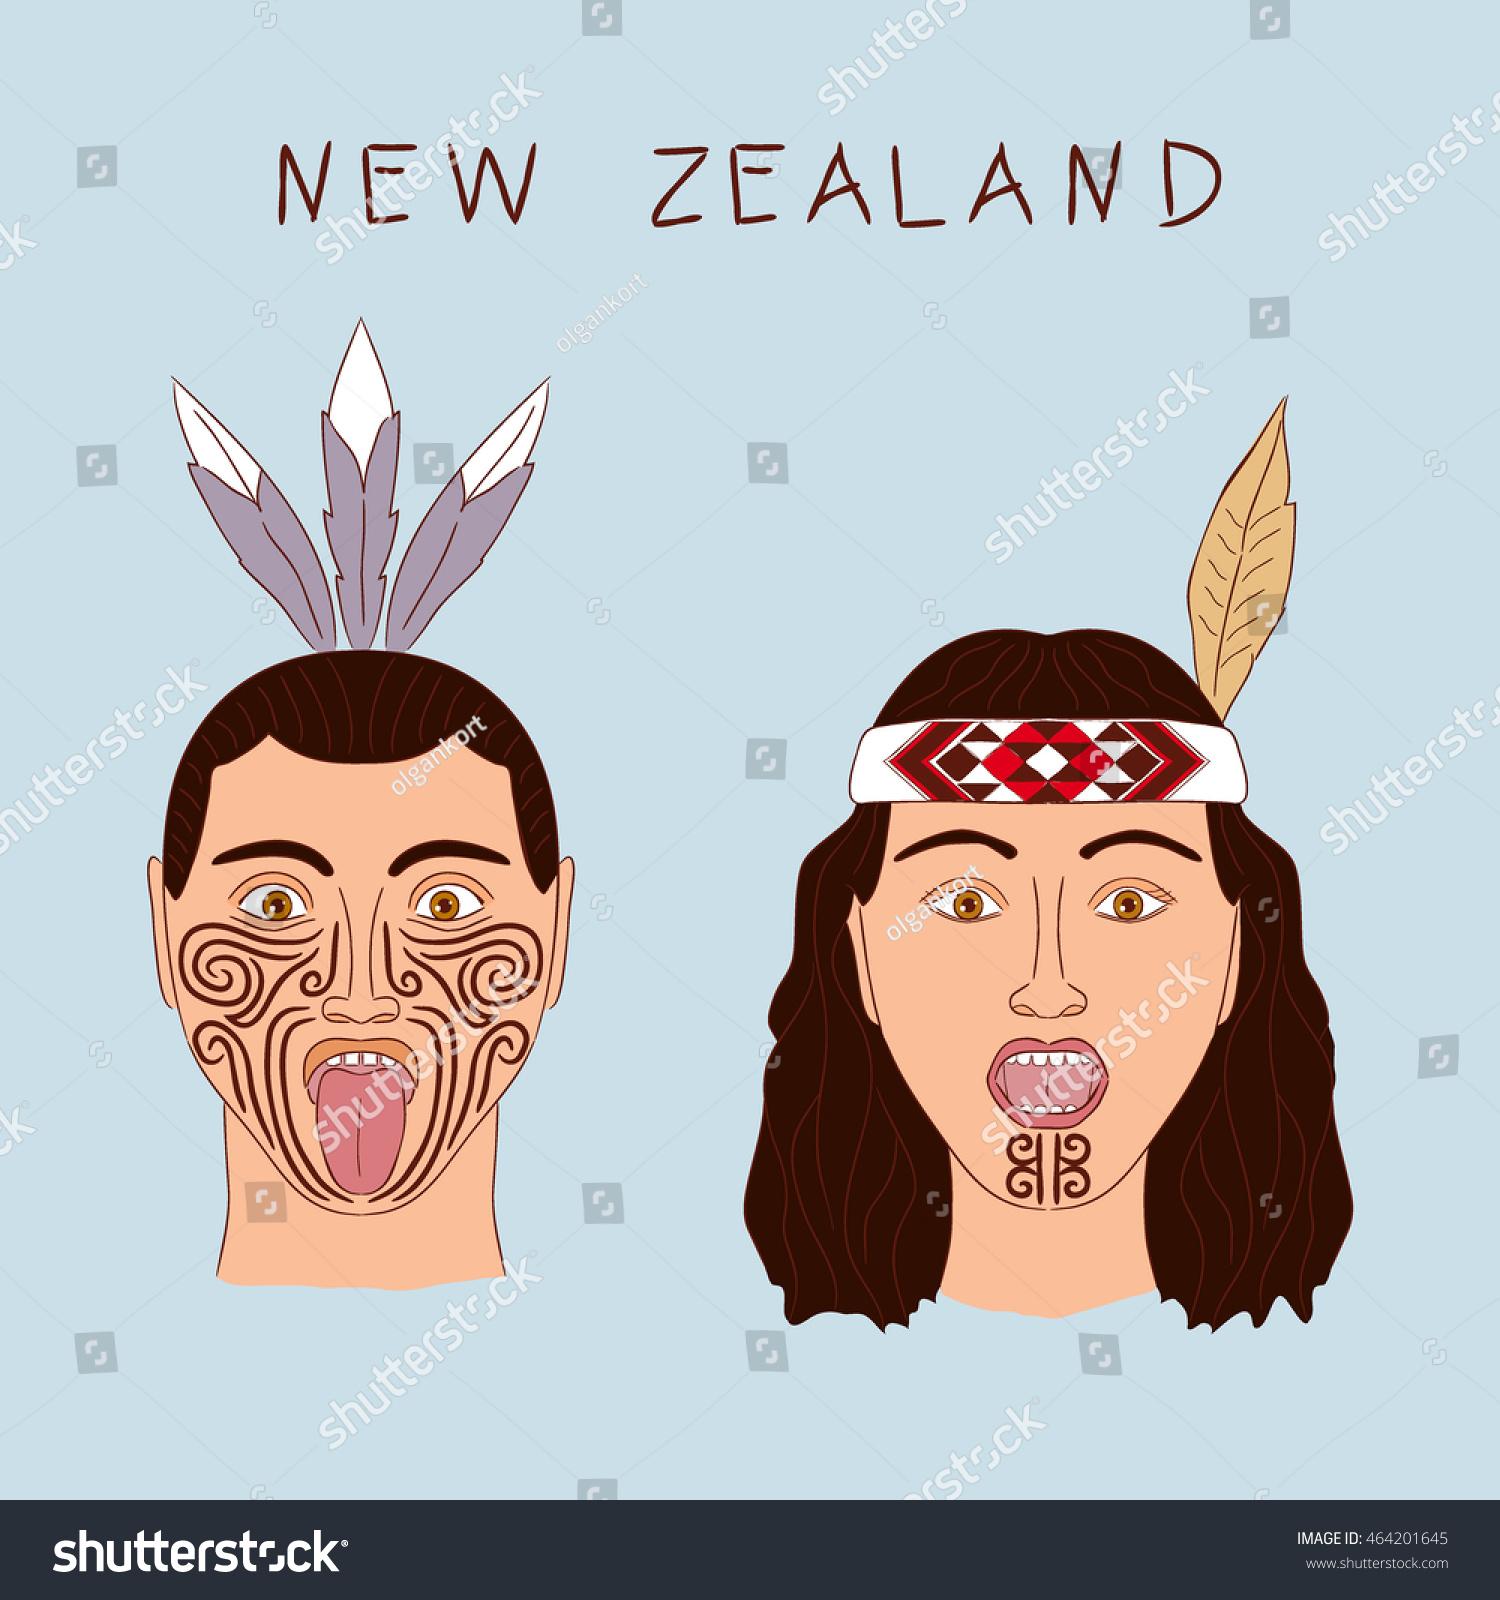 new zealand maori tribe man woman stock vector 464201645. Black Bedroom Furniture Sets. Home Design Ideas